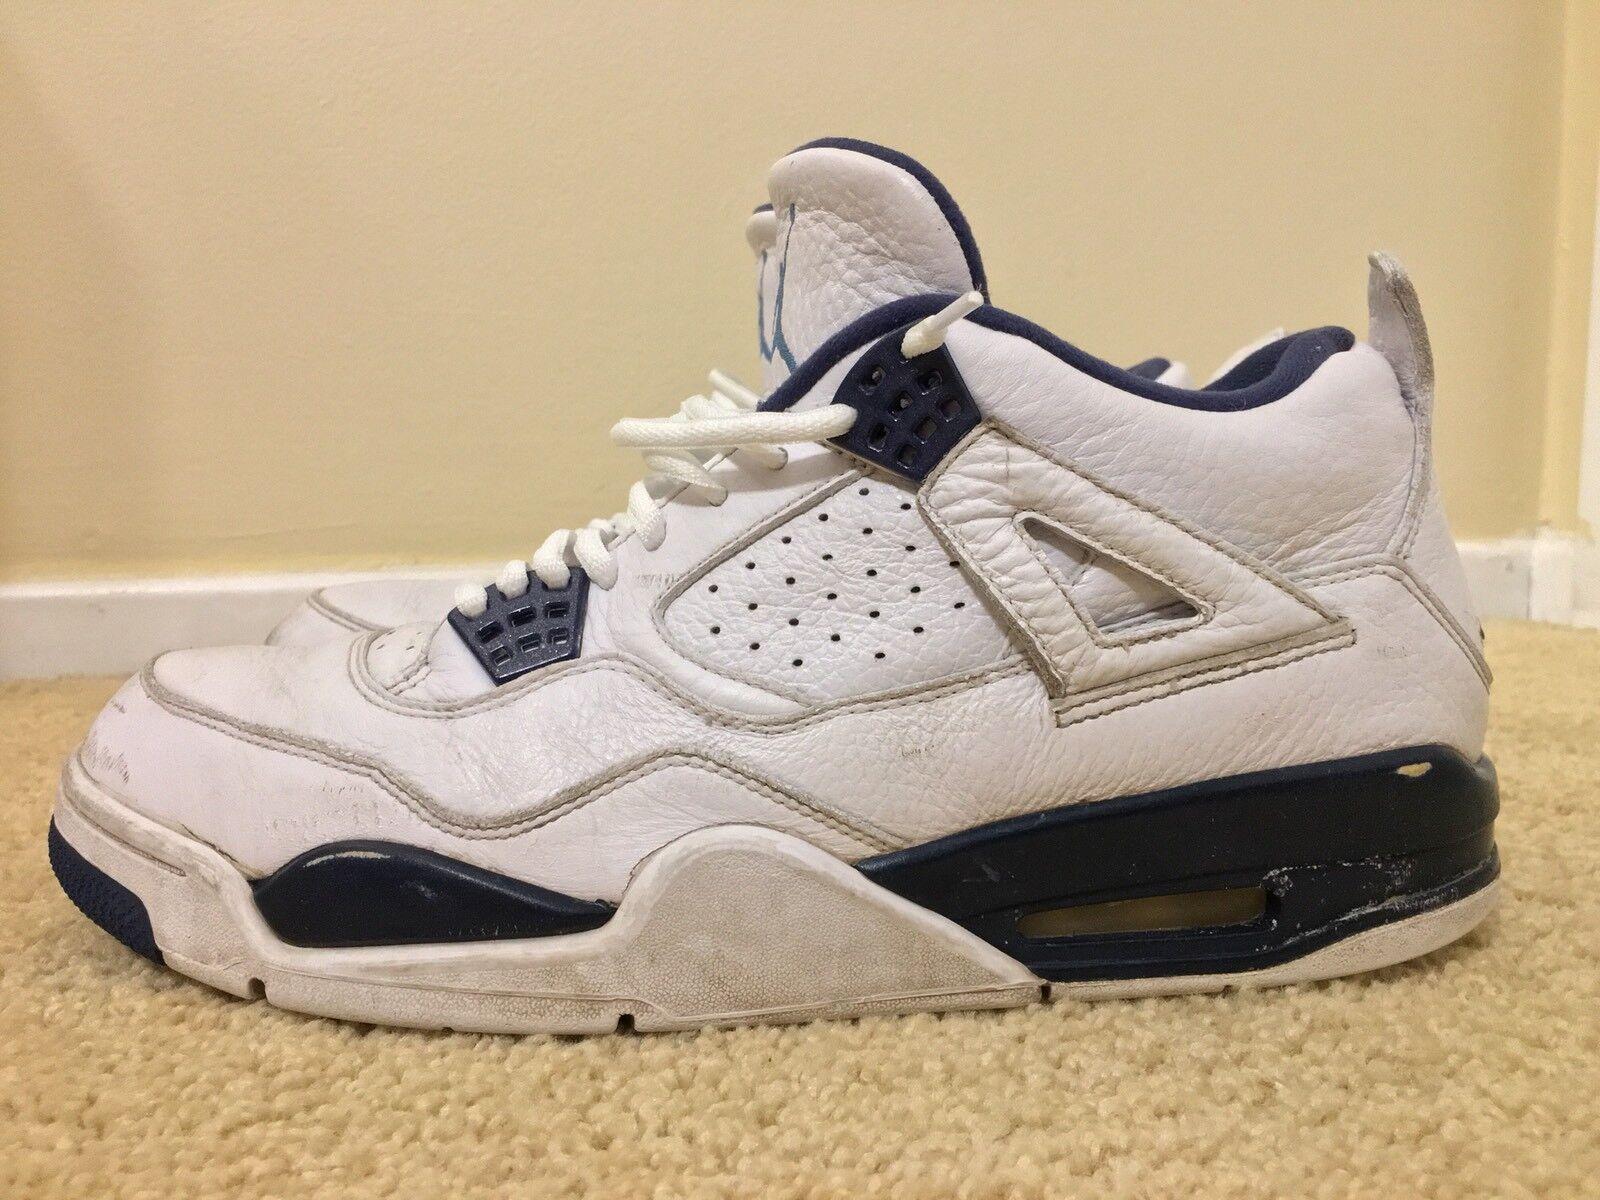 Nike air jordan retrò 4 iv [107] 314254 columbia blu, bianco / blu, numero 43